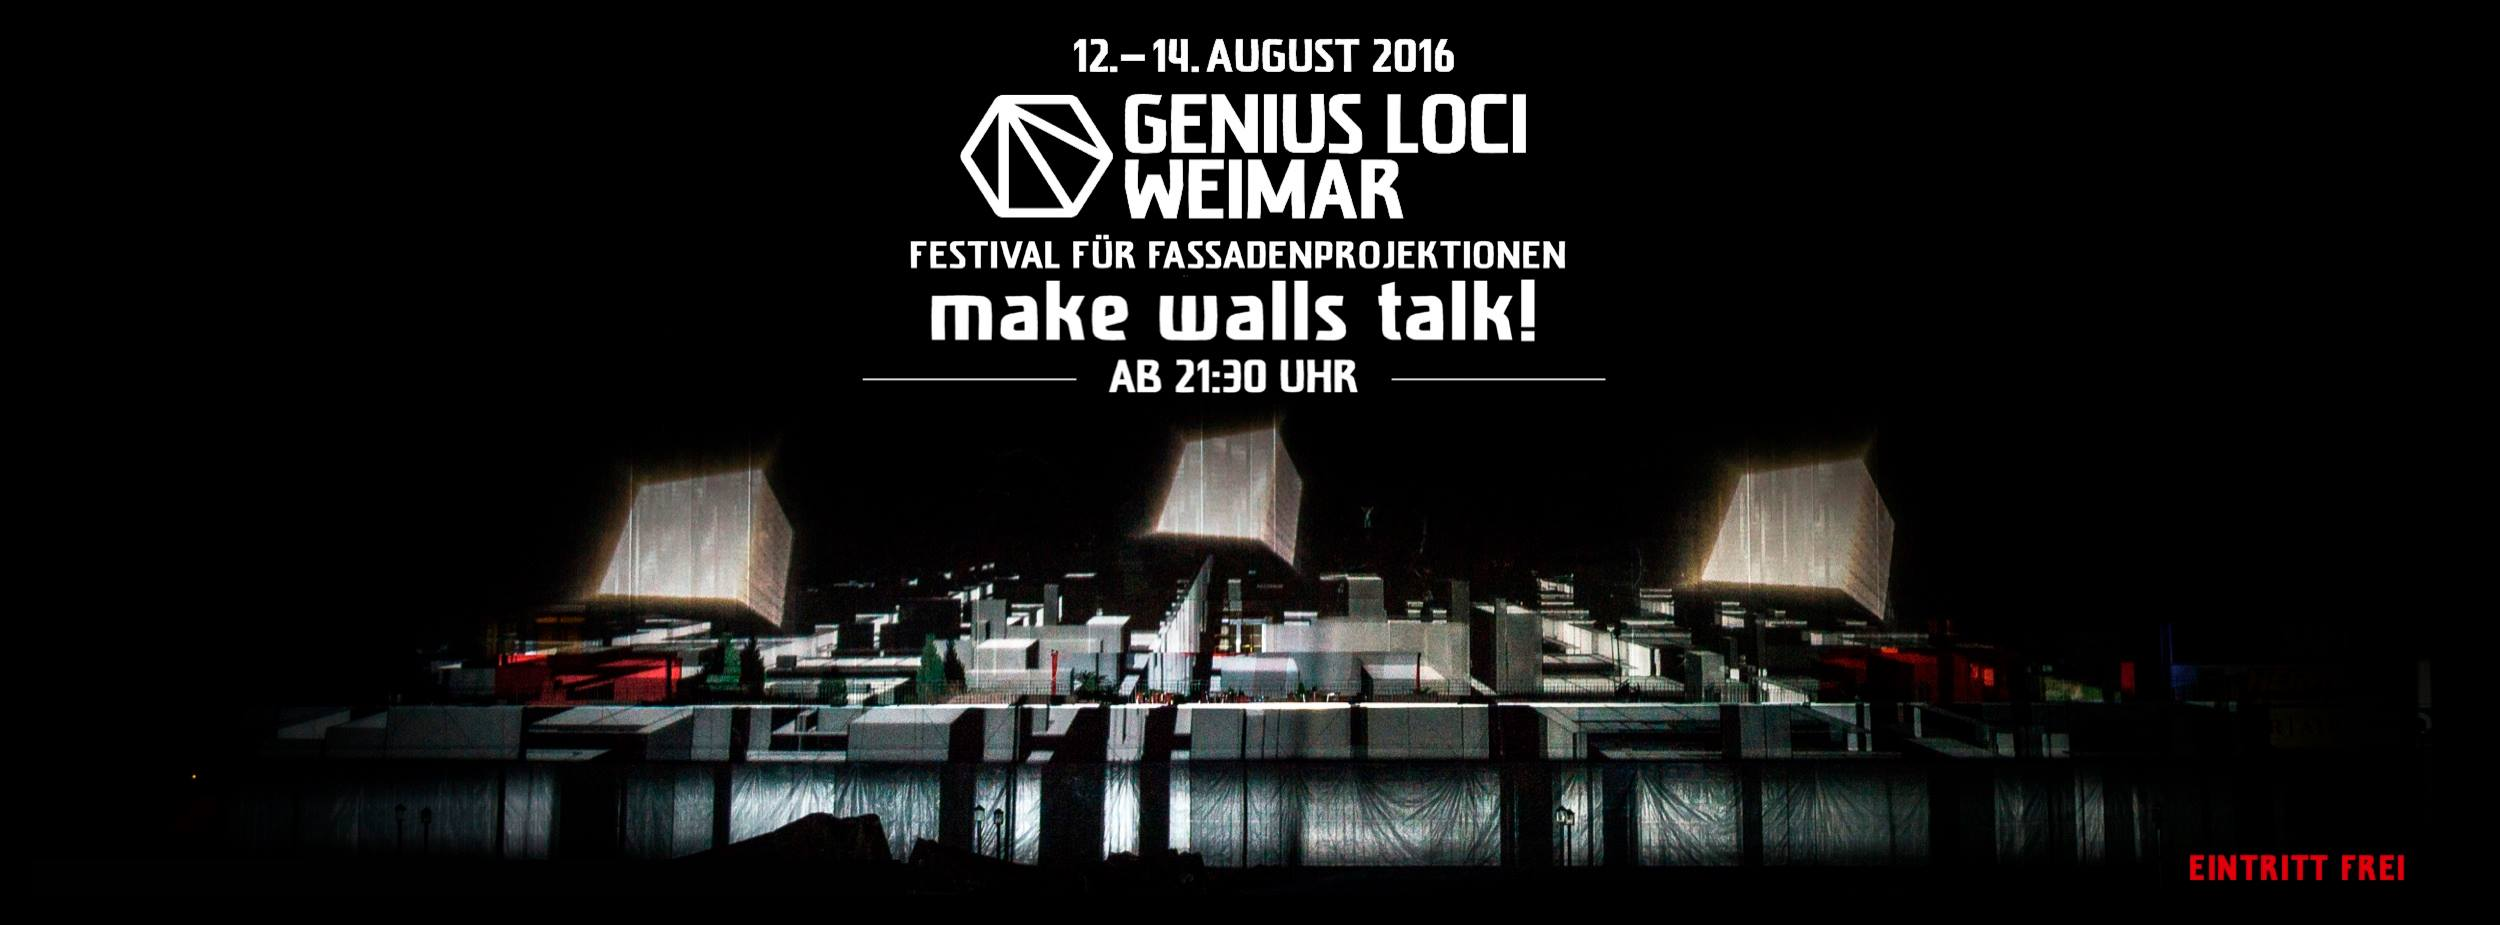 Lighting-Inspiration.com_Genius-Loci-Weimar-Festival_Flyer.jpg